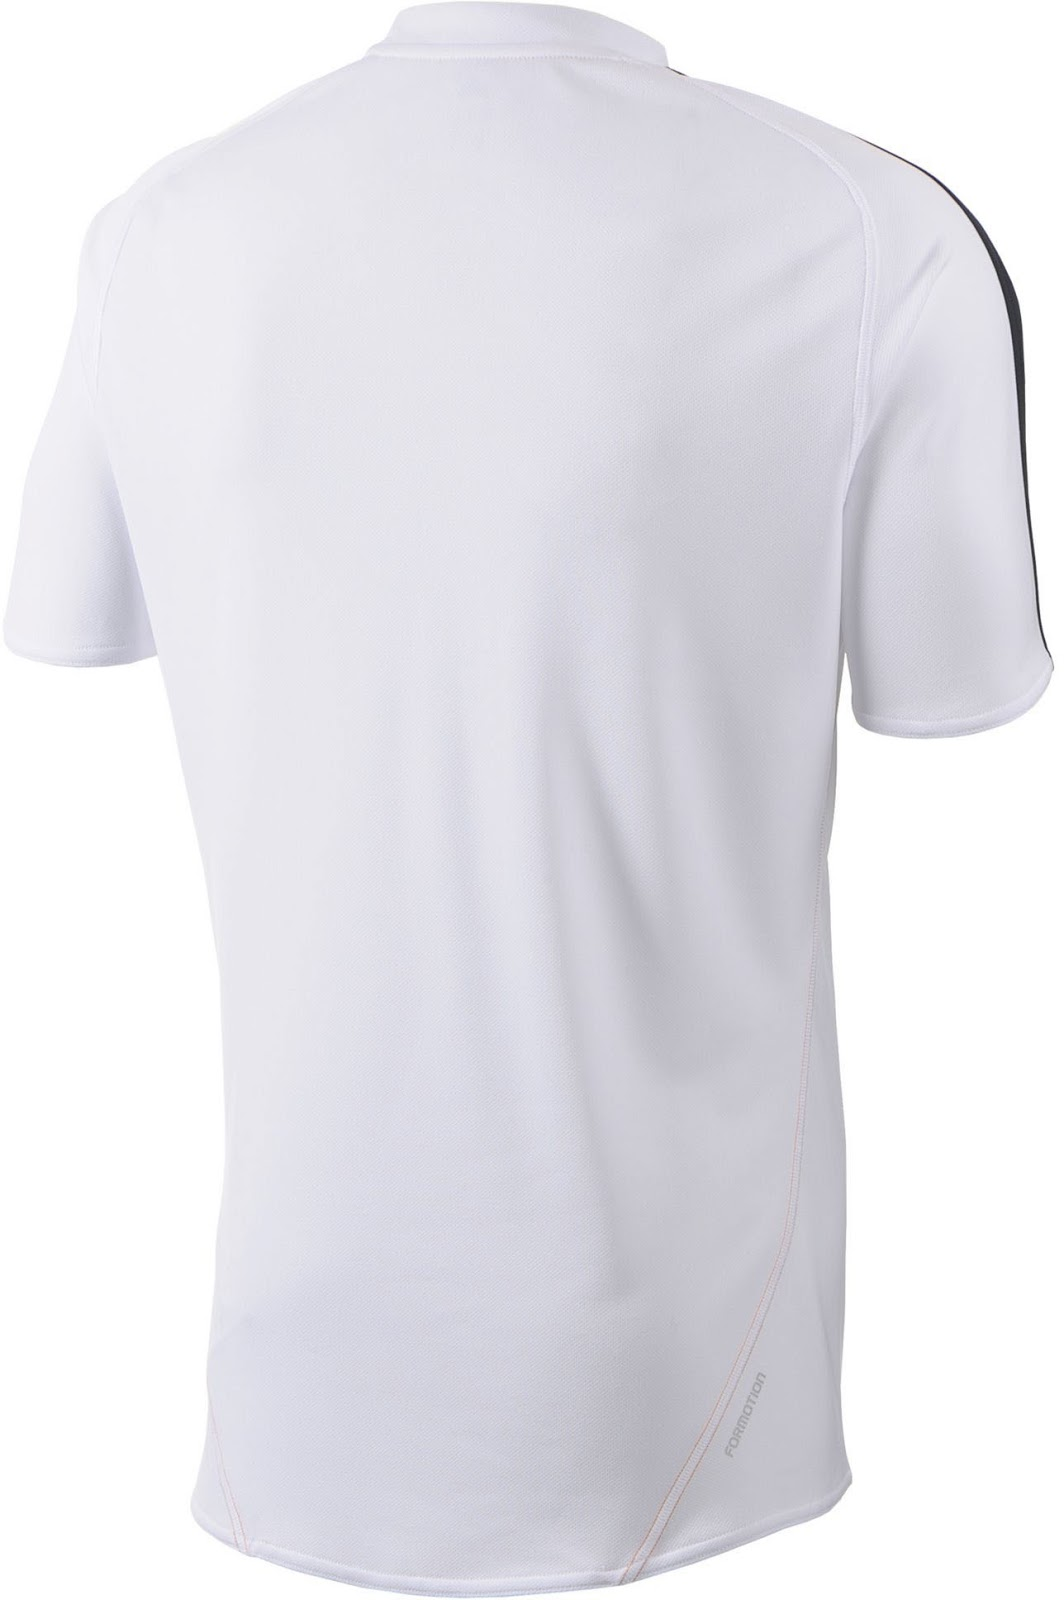 cheap for discount 6038d 396b0 ADITYA NUGRAHA MAHENDRA PUTERA: Real Madrid 13/14 Training ...